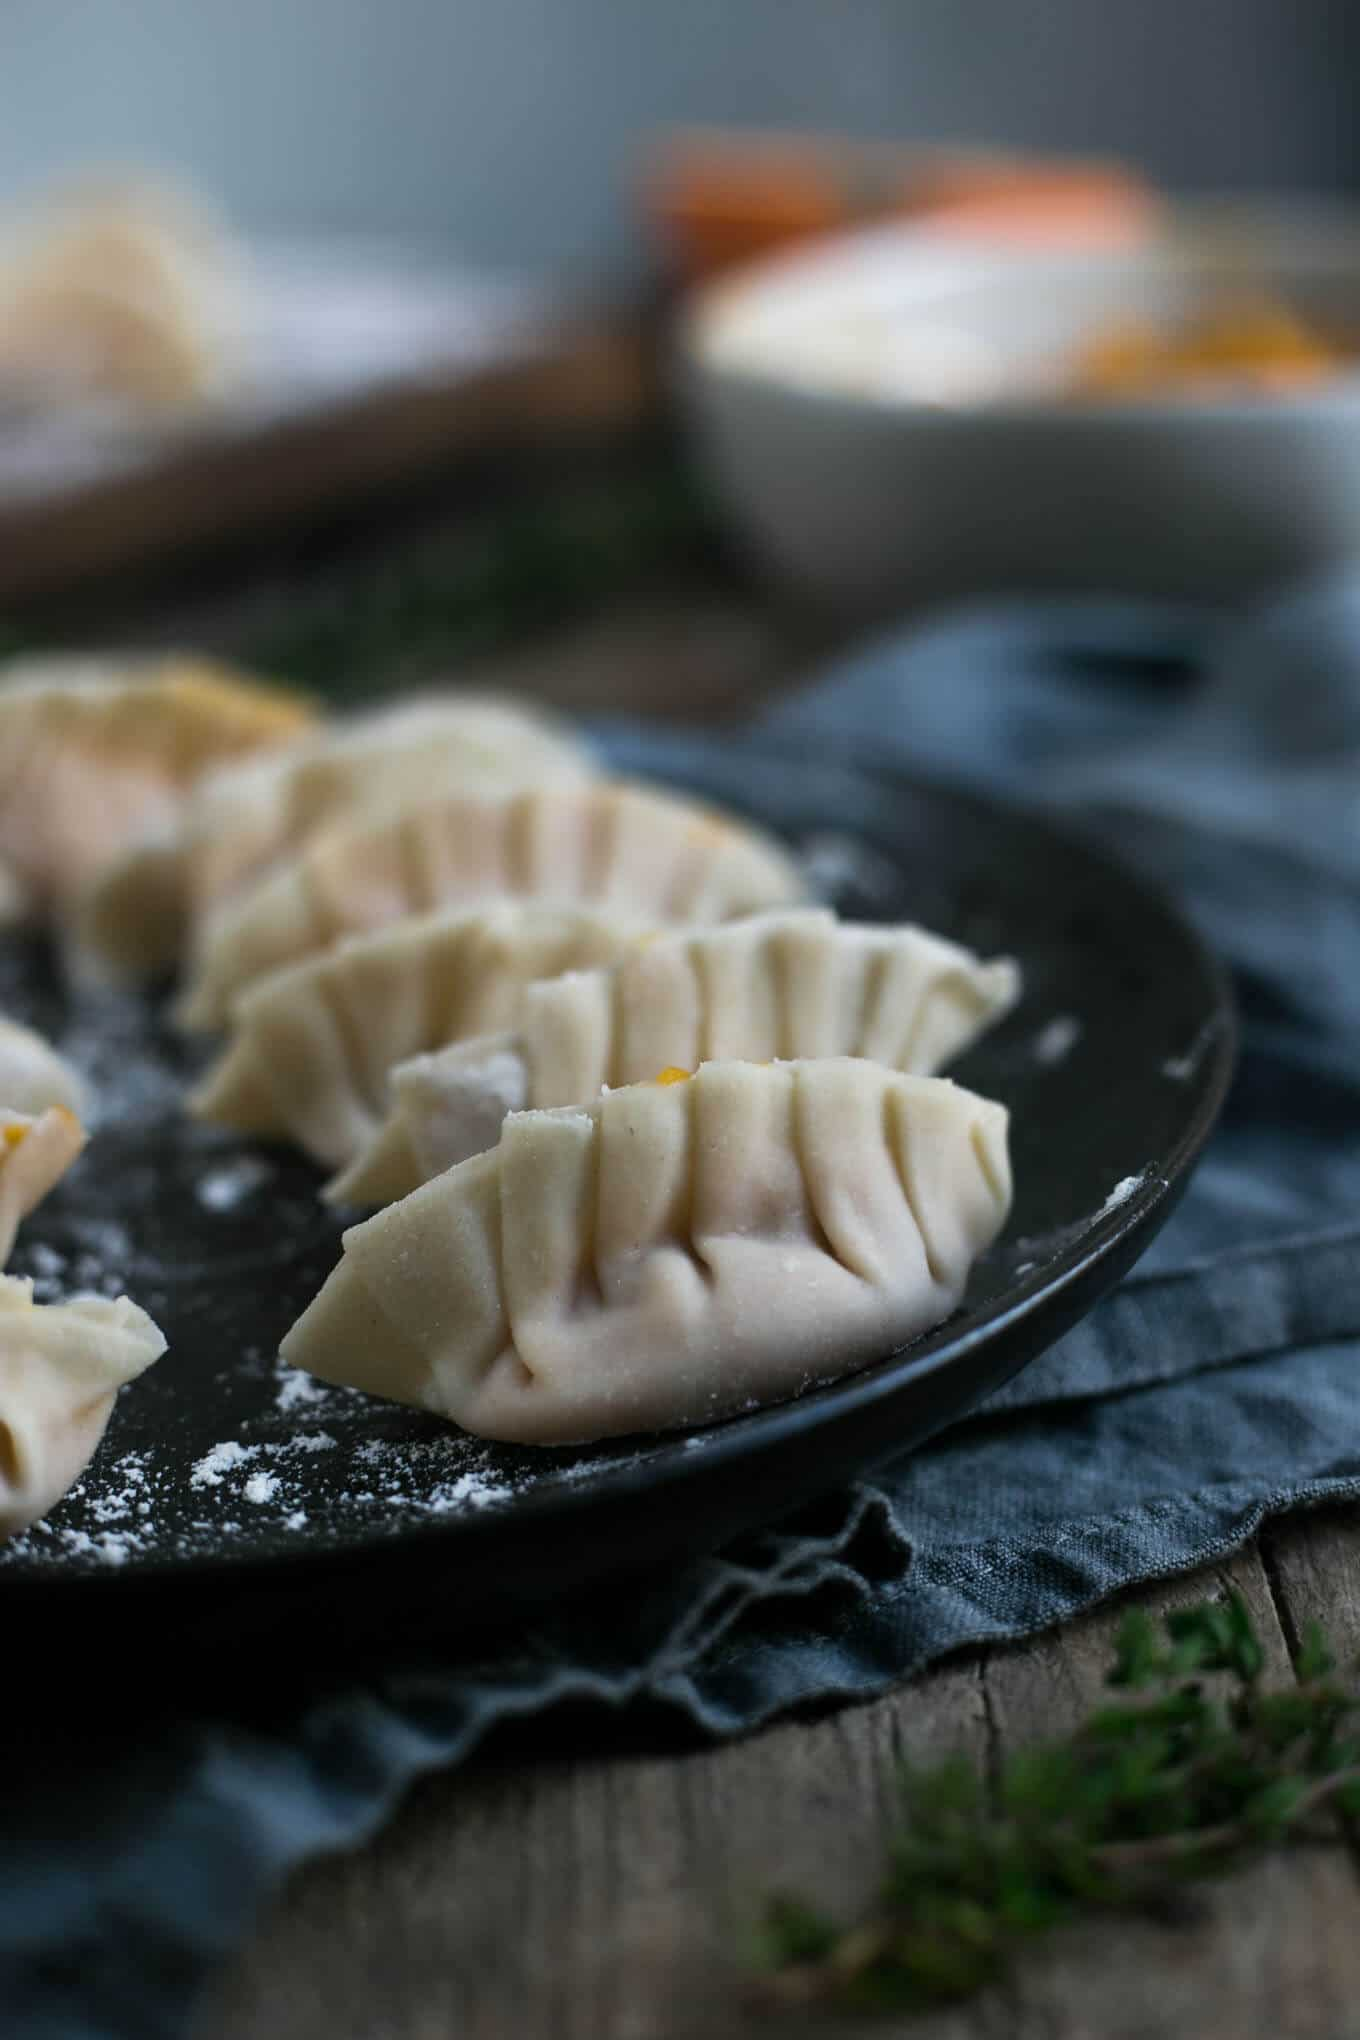 Traditional goyoza dumplings with pumpkin and root vegetable filling #vegan #goyoza | via @annabanana.co